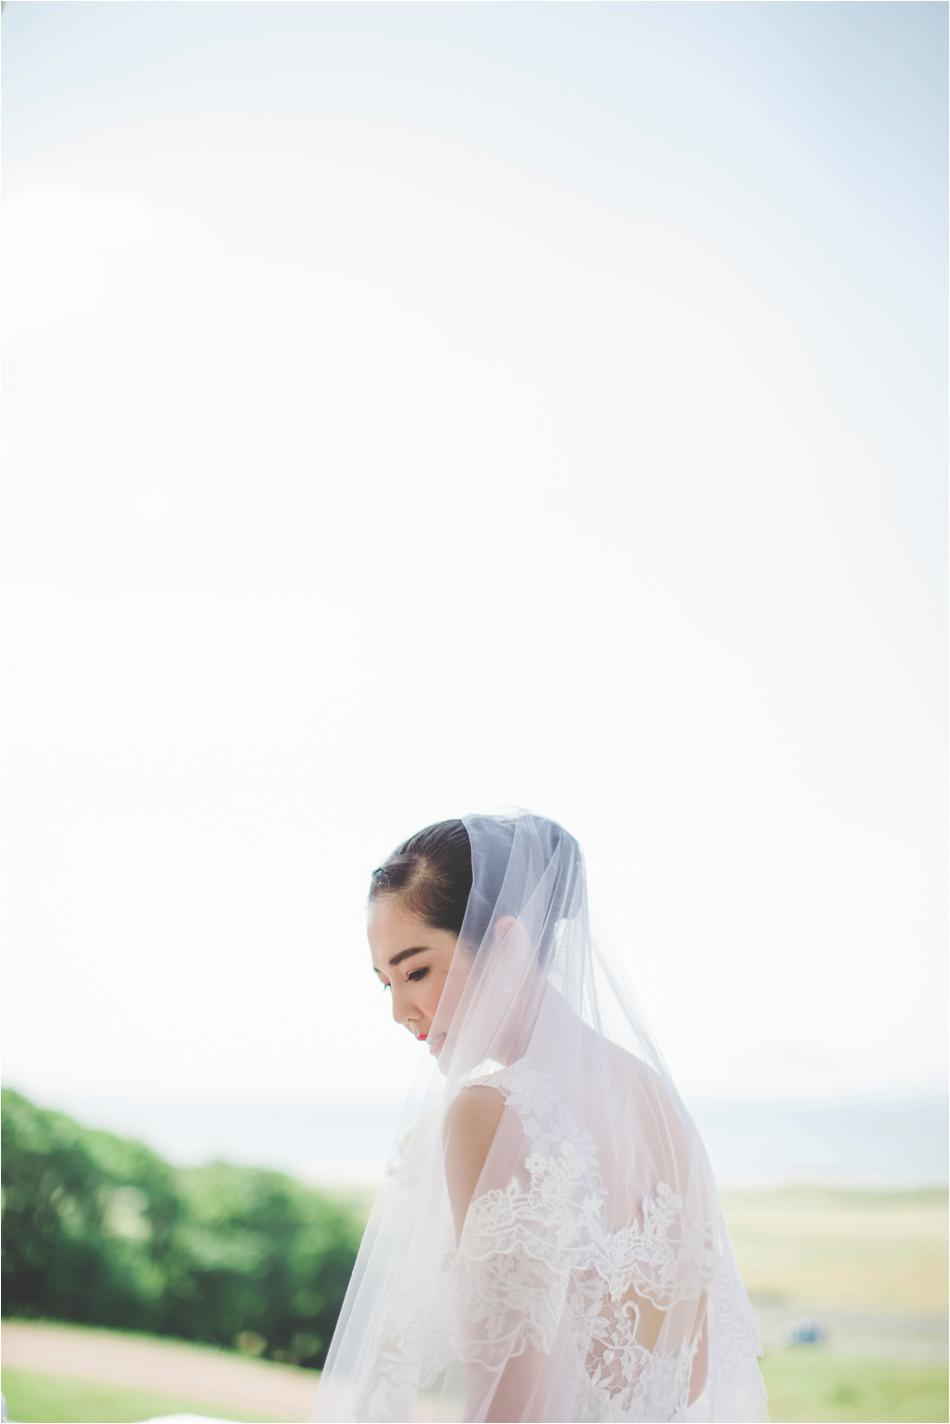 fine art wedding photographers scotland glasgow 3-26.jpg